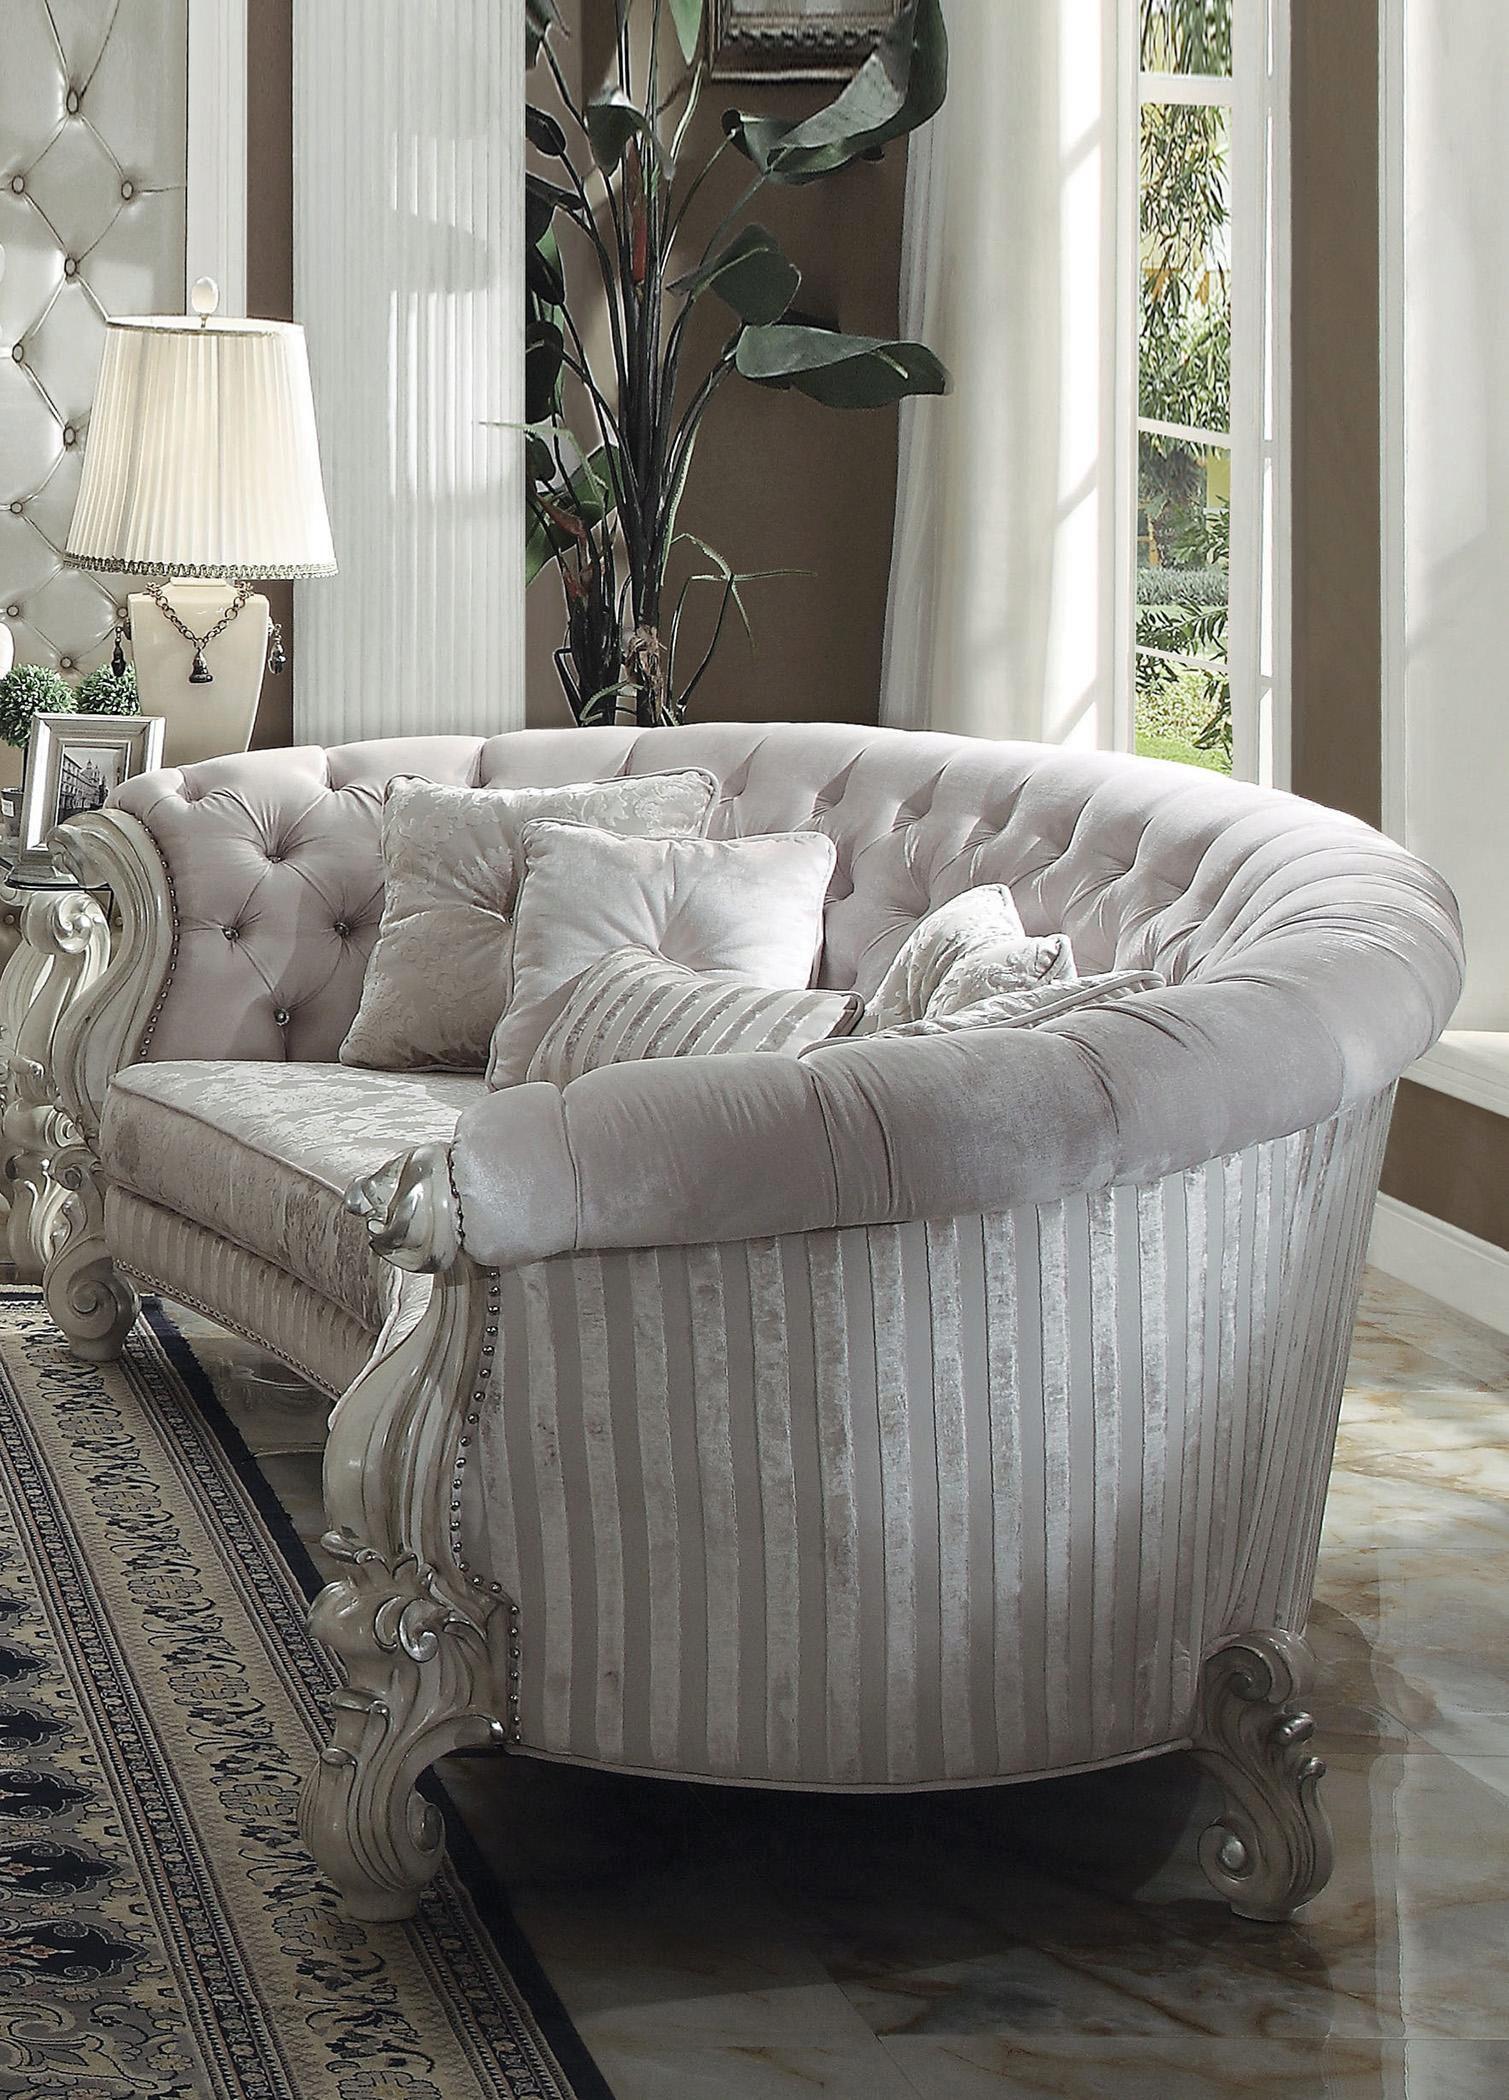 "Ivory Velvet Antique White Levon Curved 55"" Crystal Tufted In French Seamed Sectional Sofas In Velvet (View 14 of 15)"